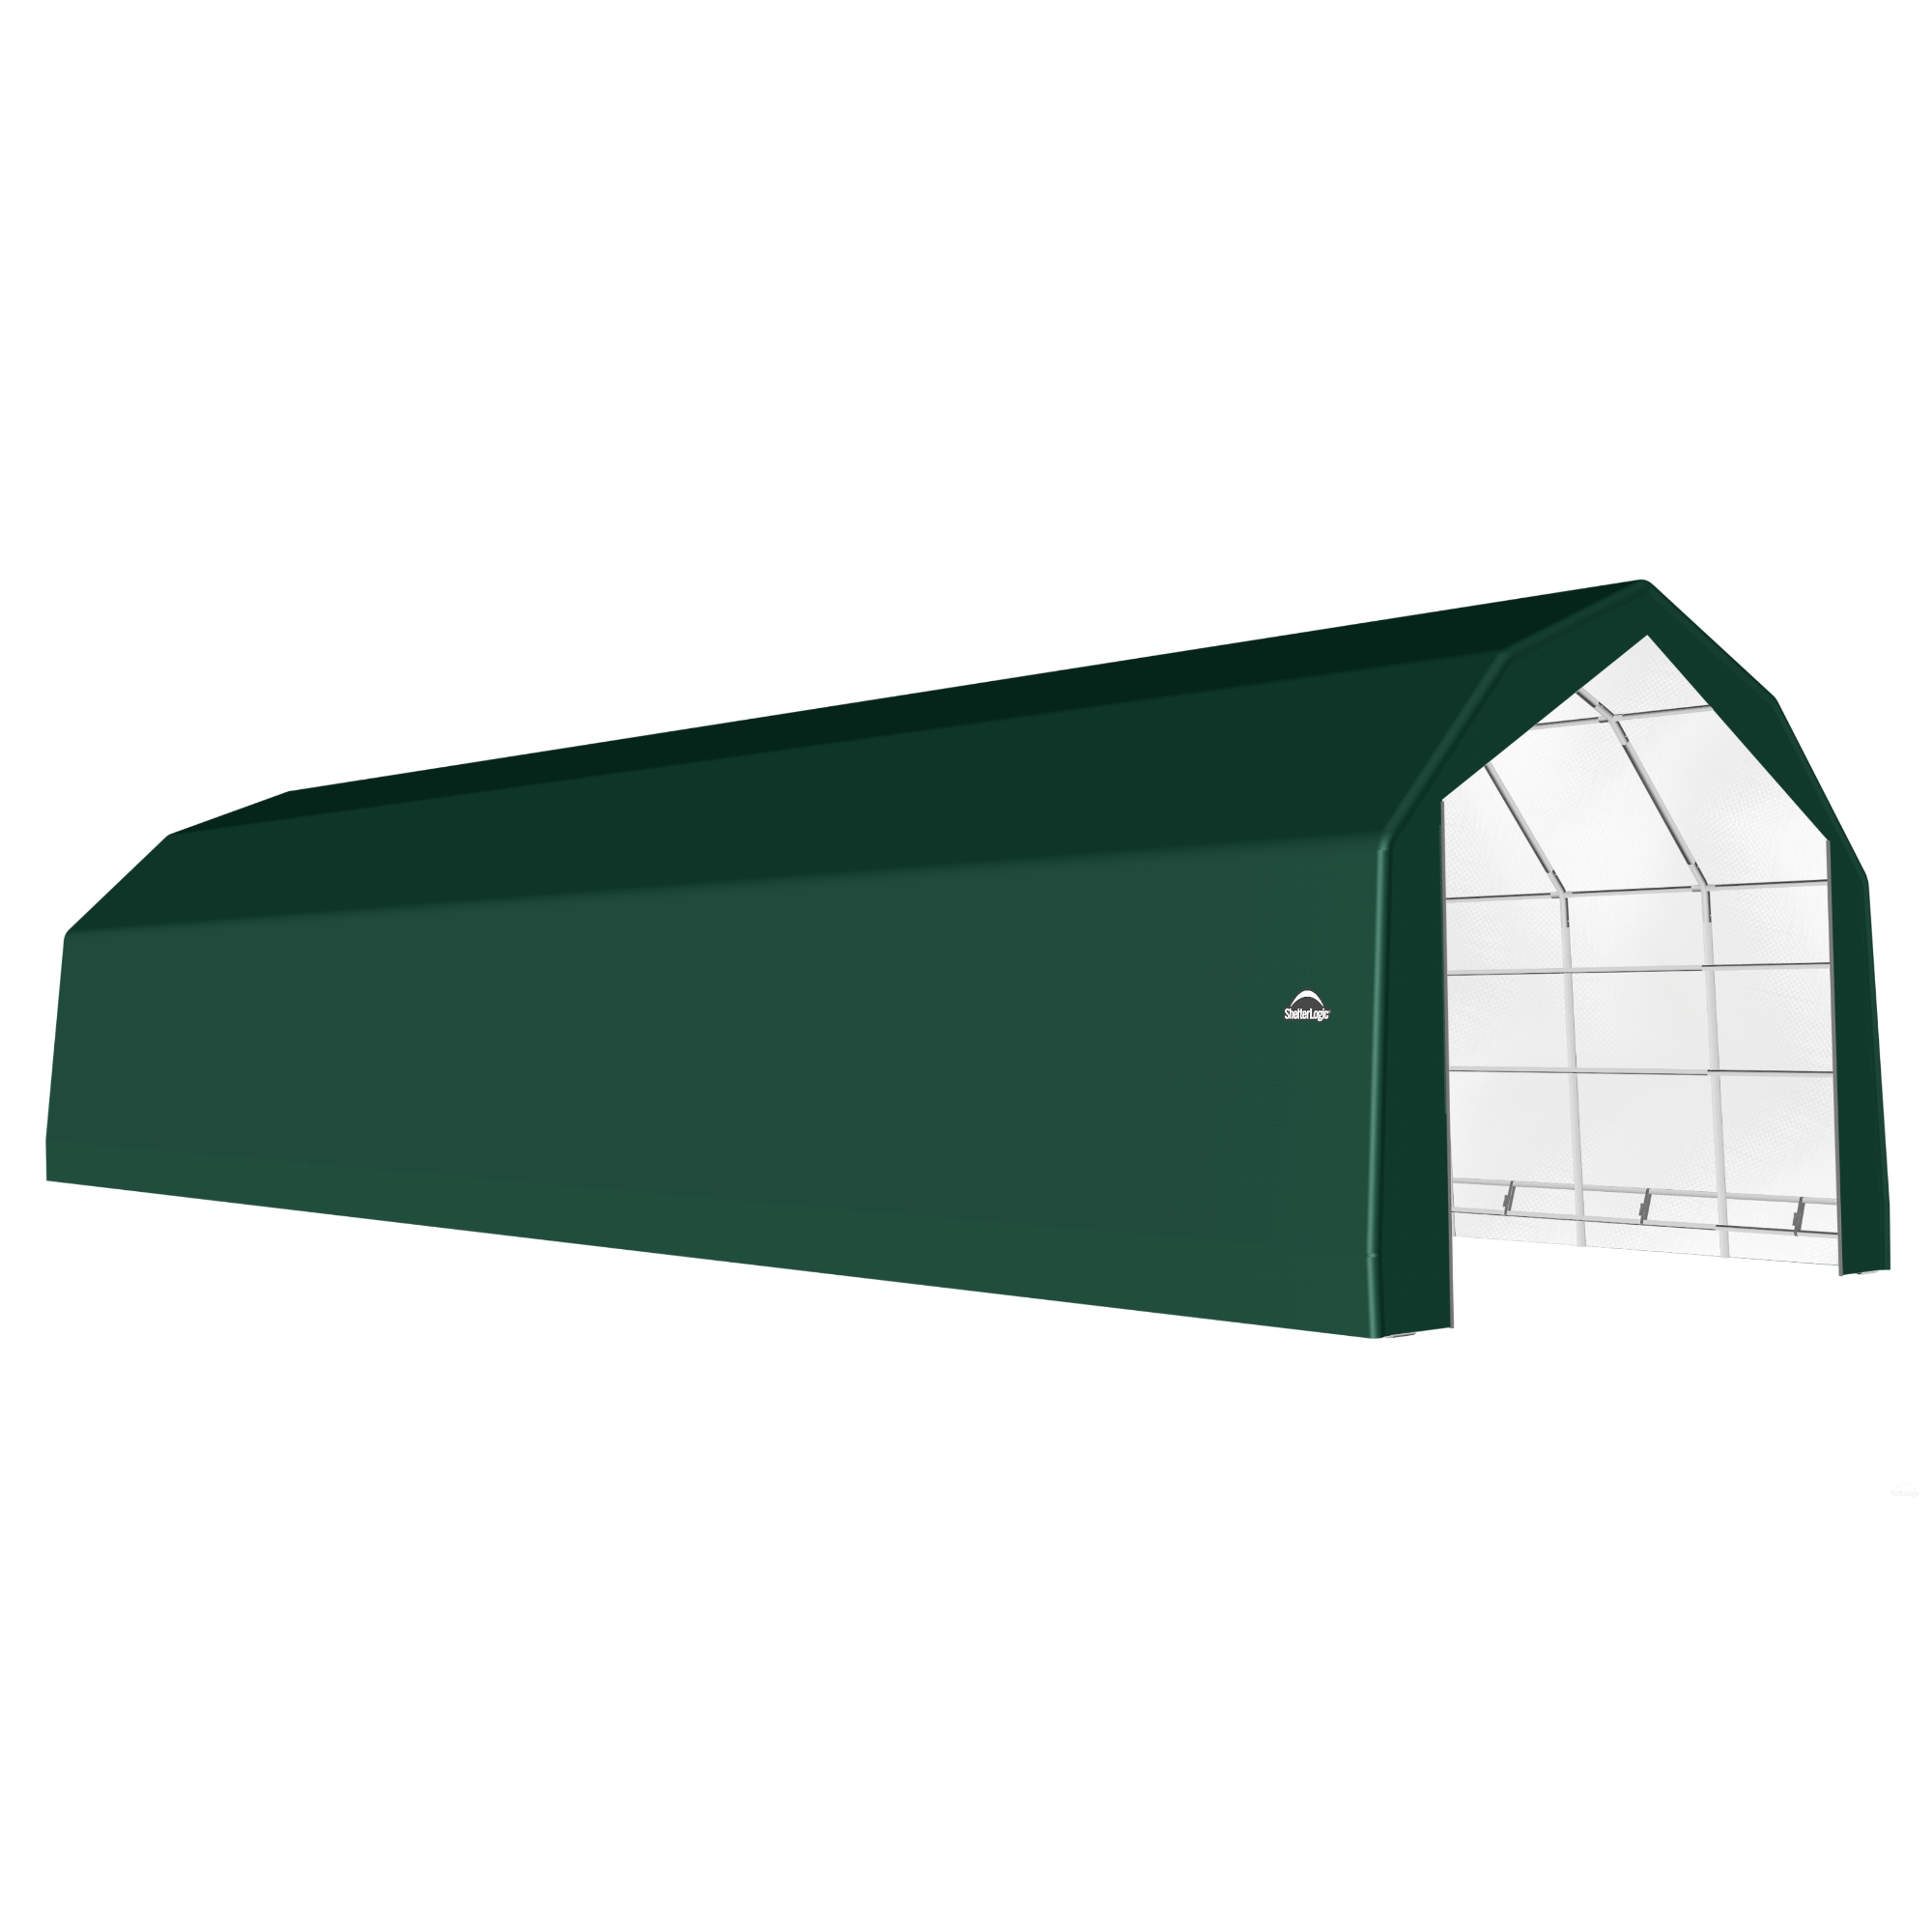 SP Barn 20X68X15 Green 14 oz PE Shelter